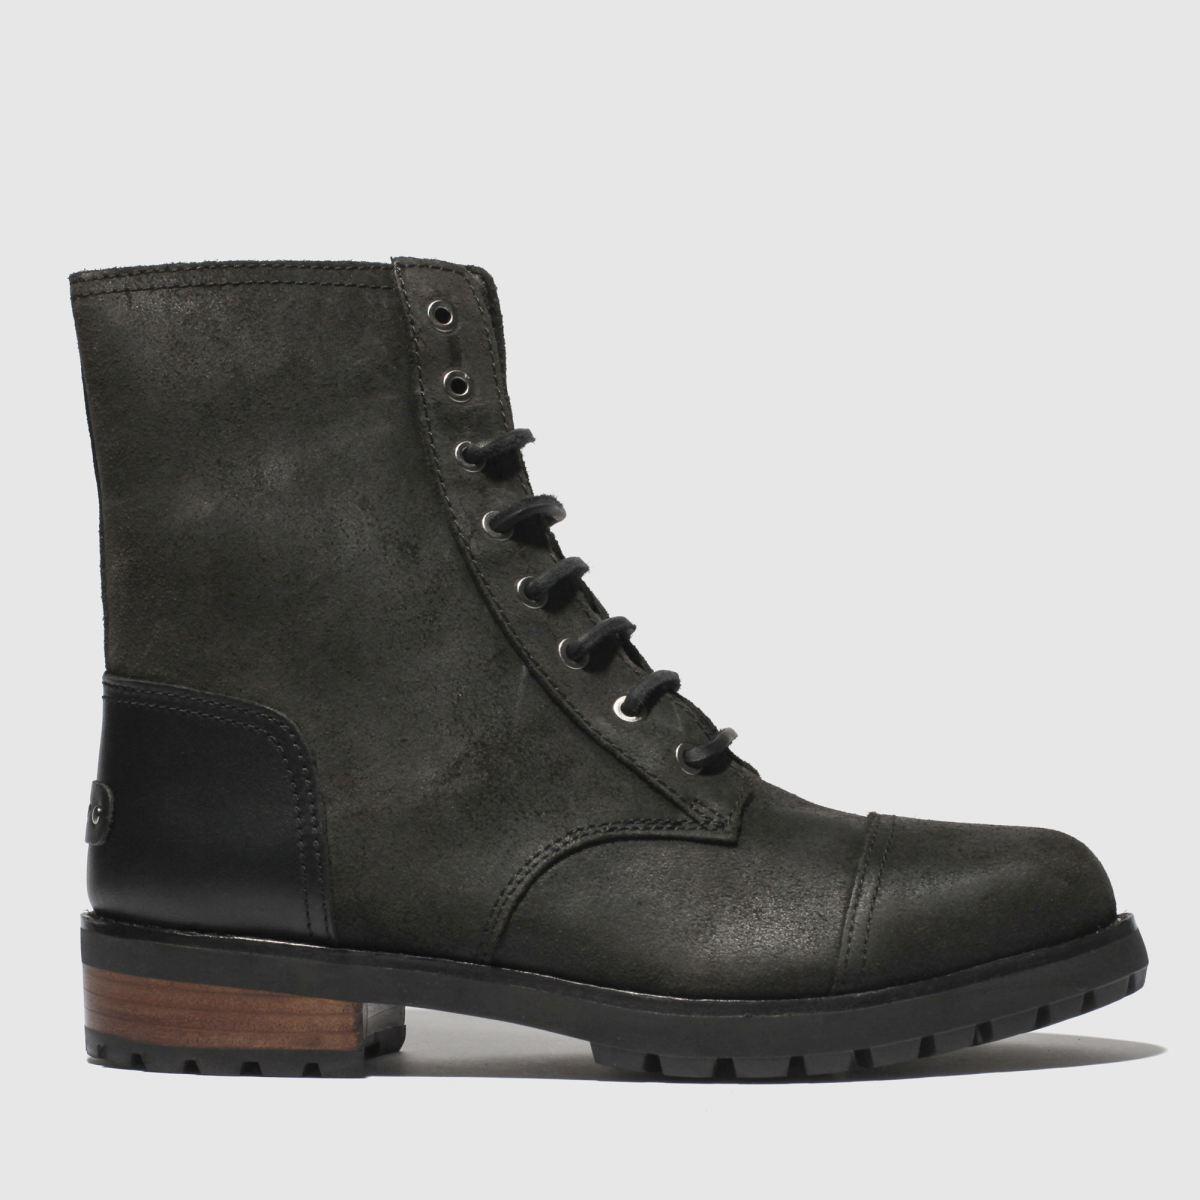 Ugg Black Kilmer Ii Boots